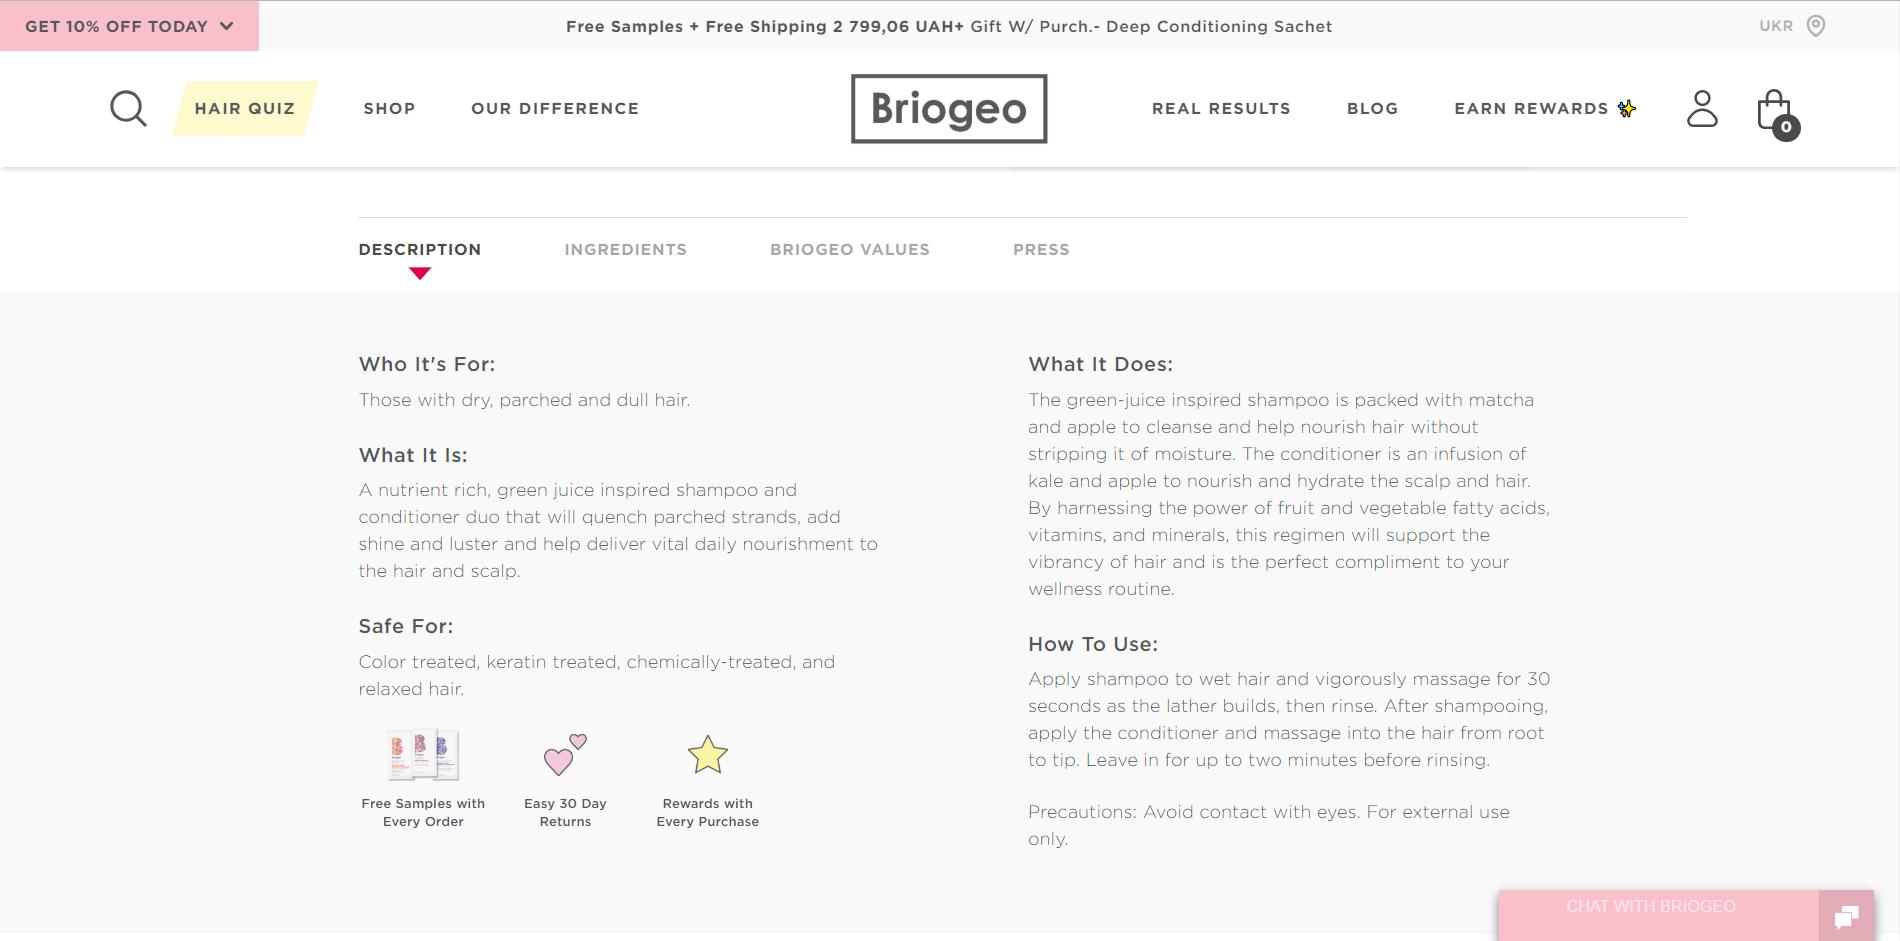 Example of product description at Briogeo